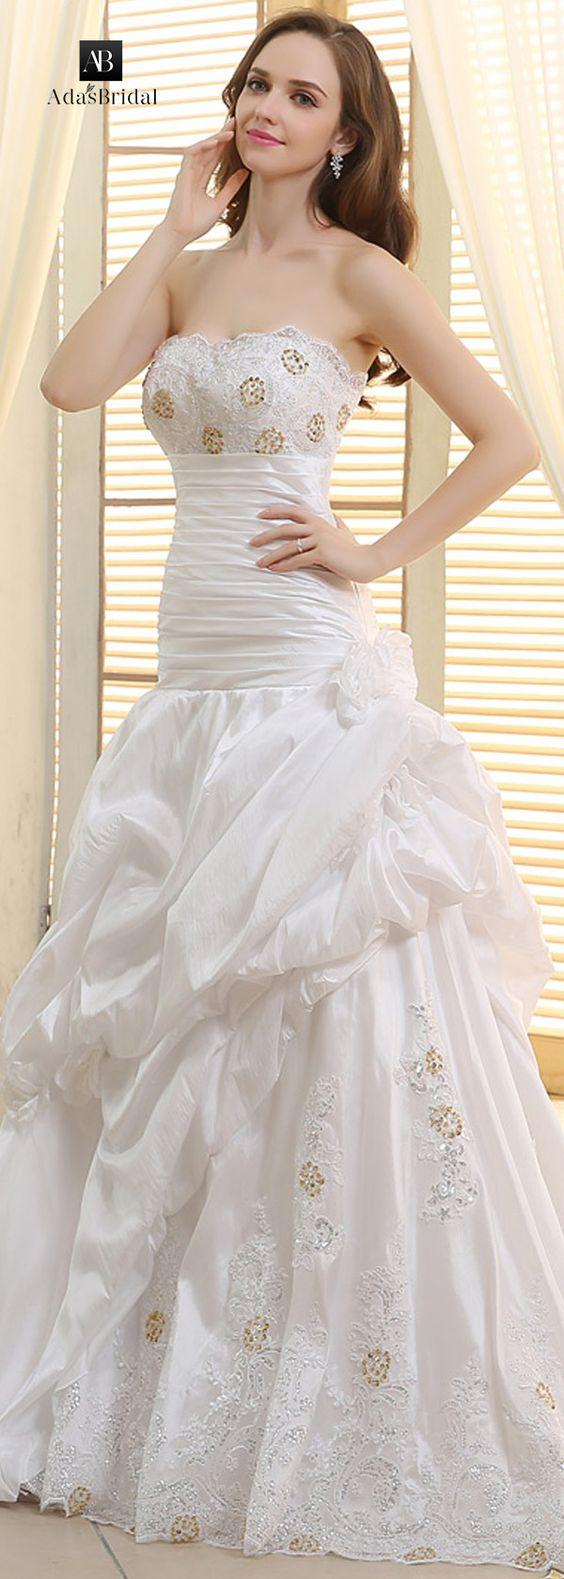 Gorgeous taffeta strapless neckline ball gown wedding dresses (WWD57424)